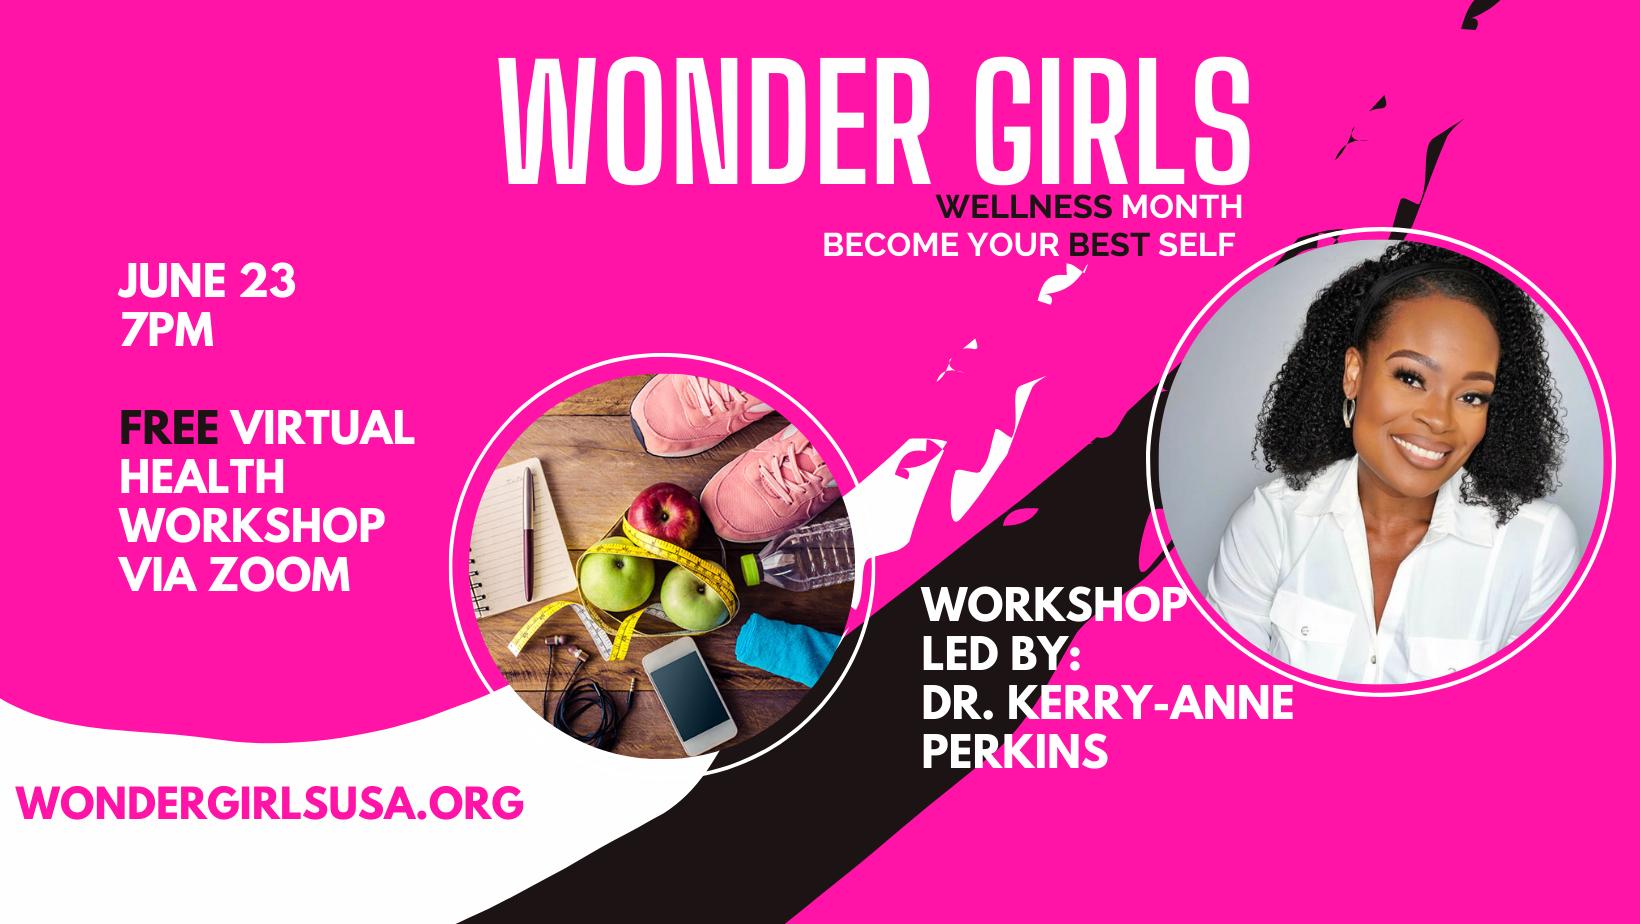 Wonder Girls Free Virtual Health Workshop with Dr. Kerry-Anne Perkins at Wonder Girls